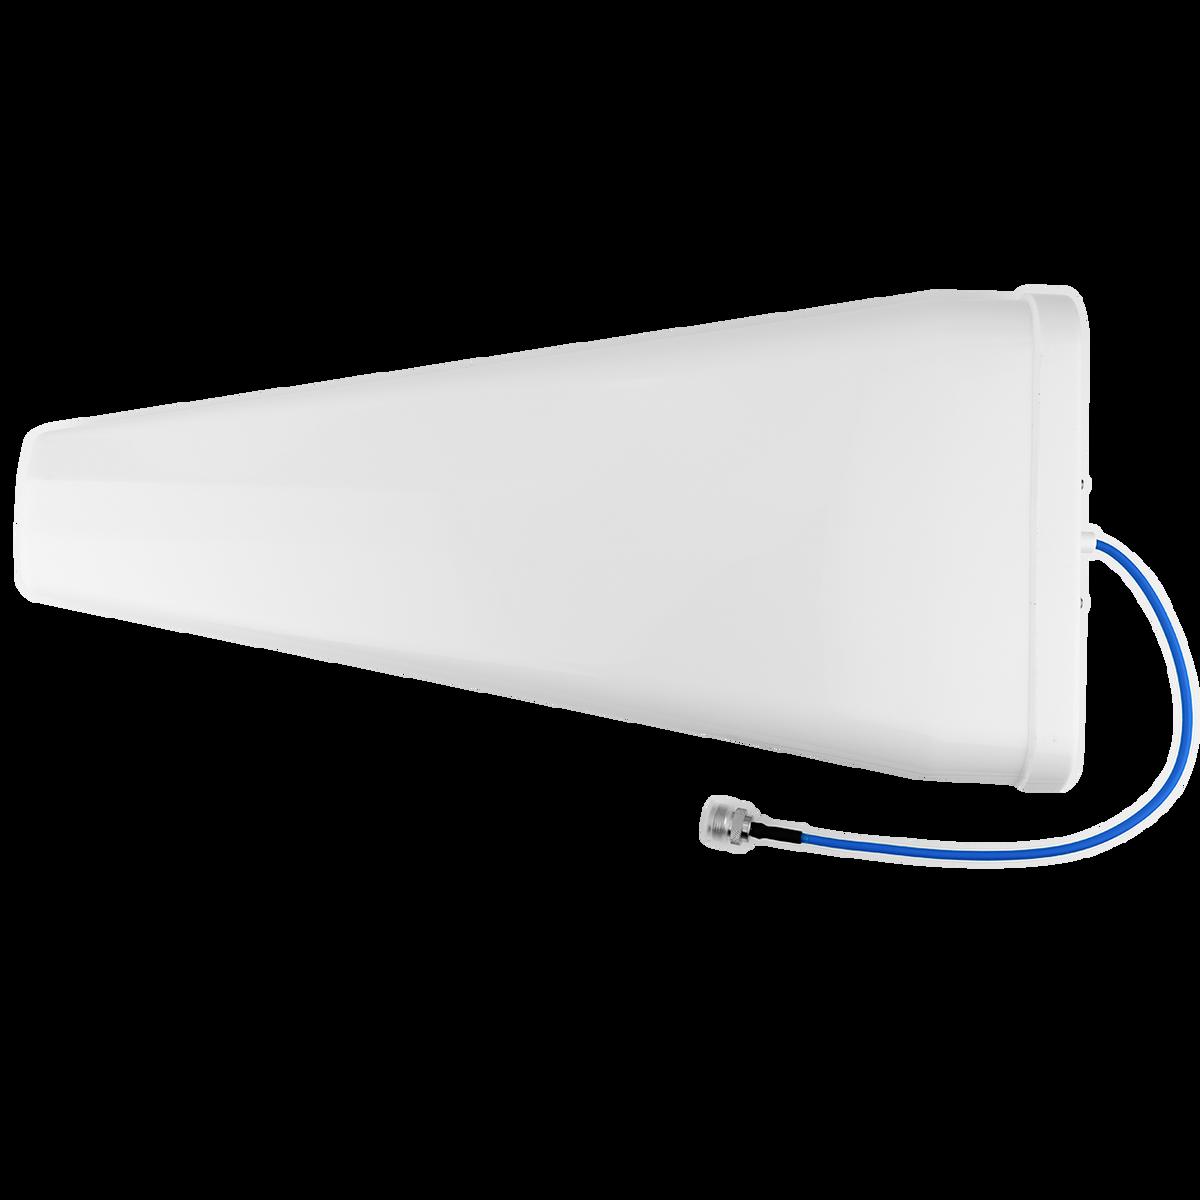 Bolton Technical Yagi Directional Antenna, 698-2700 MHz, N-Female